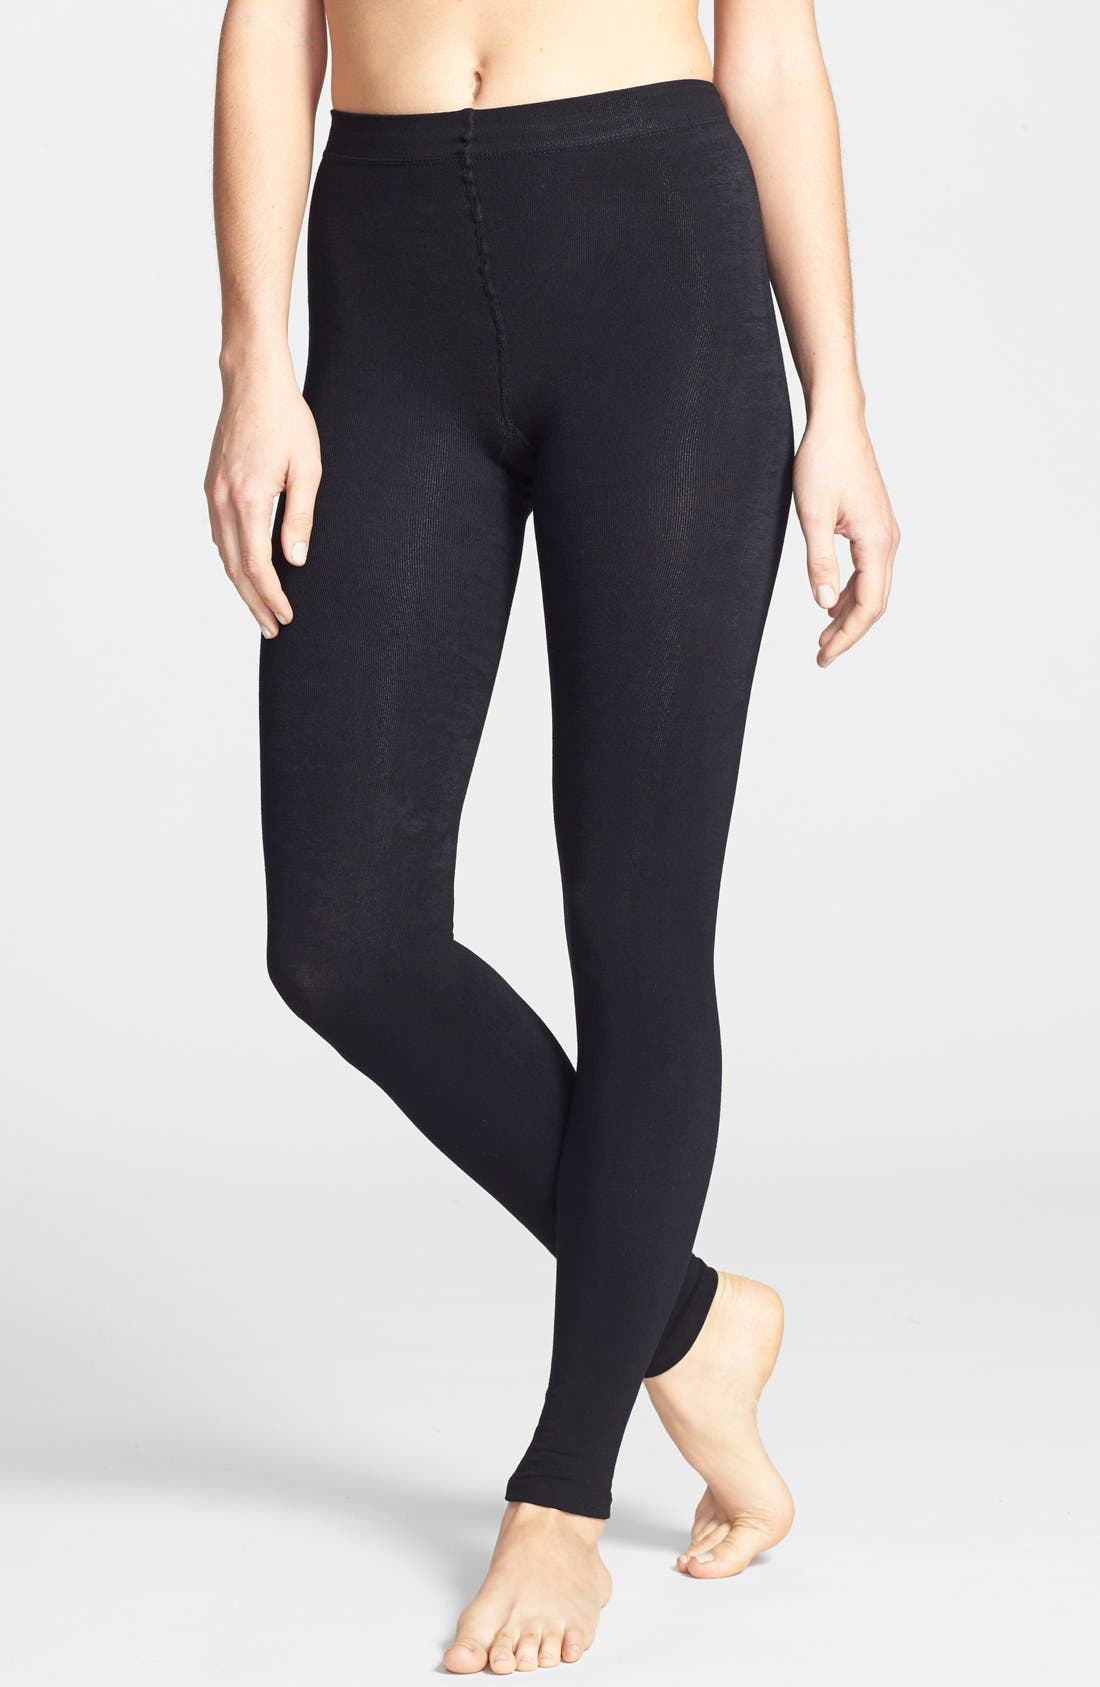 Donna Karan 'Luxe Layer' Leggings,                         Main,                         color, Black